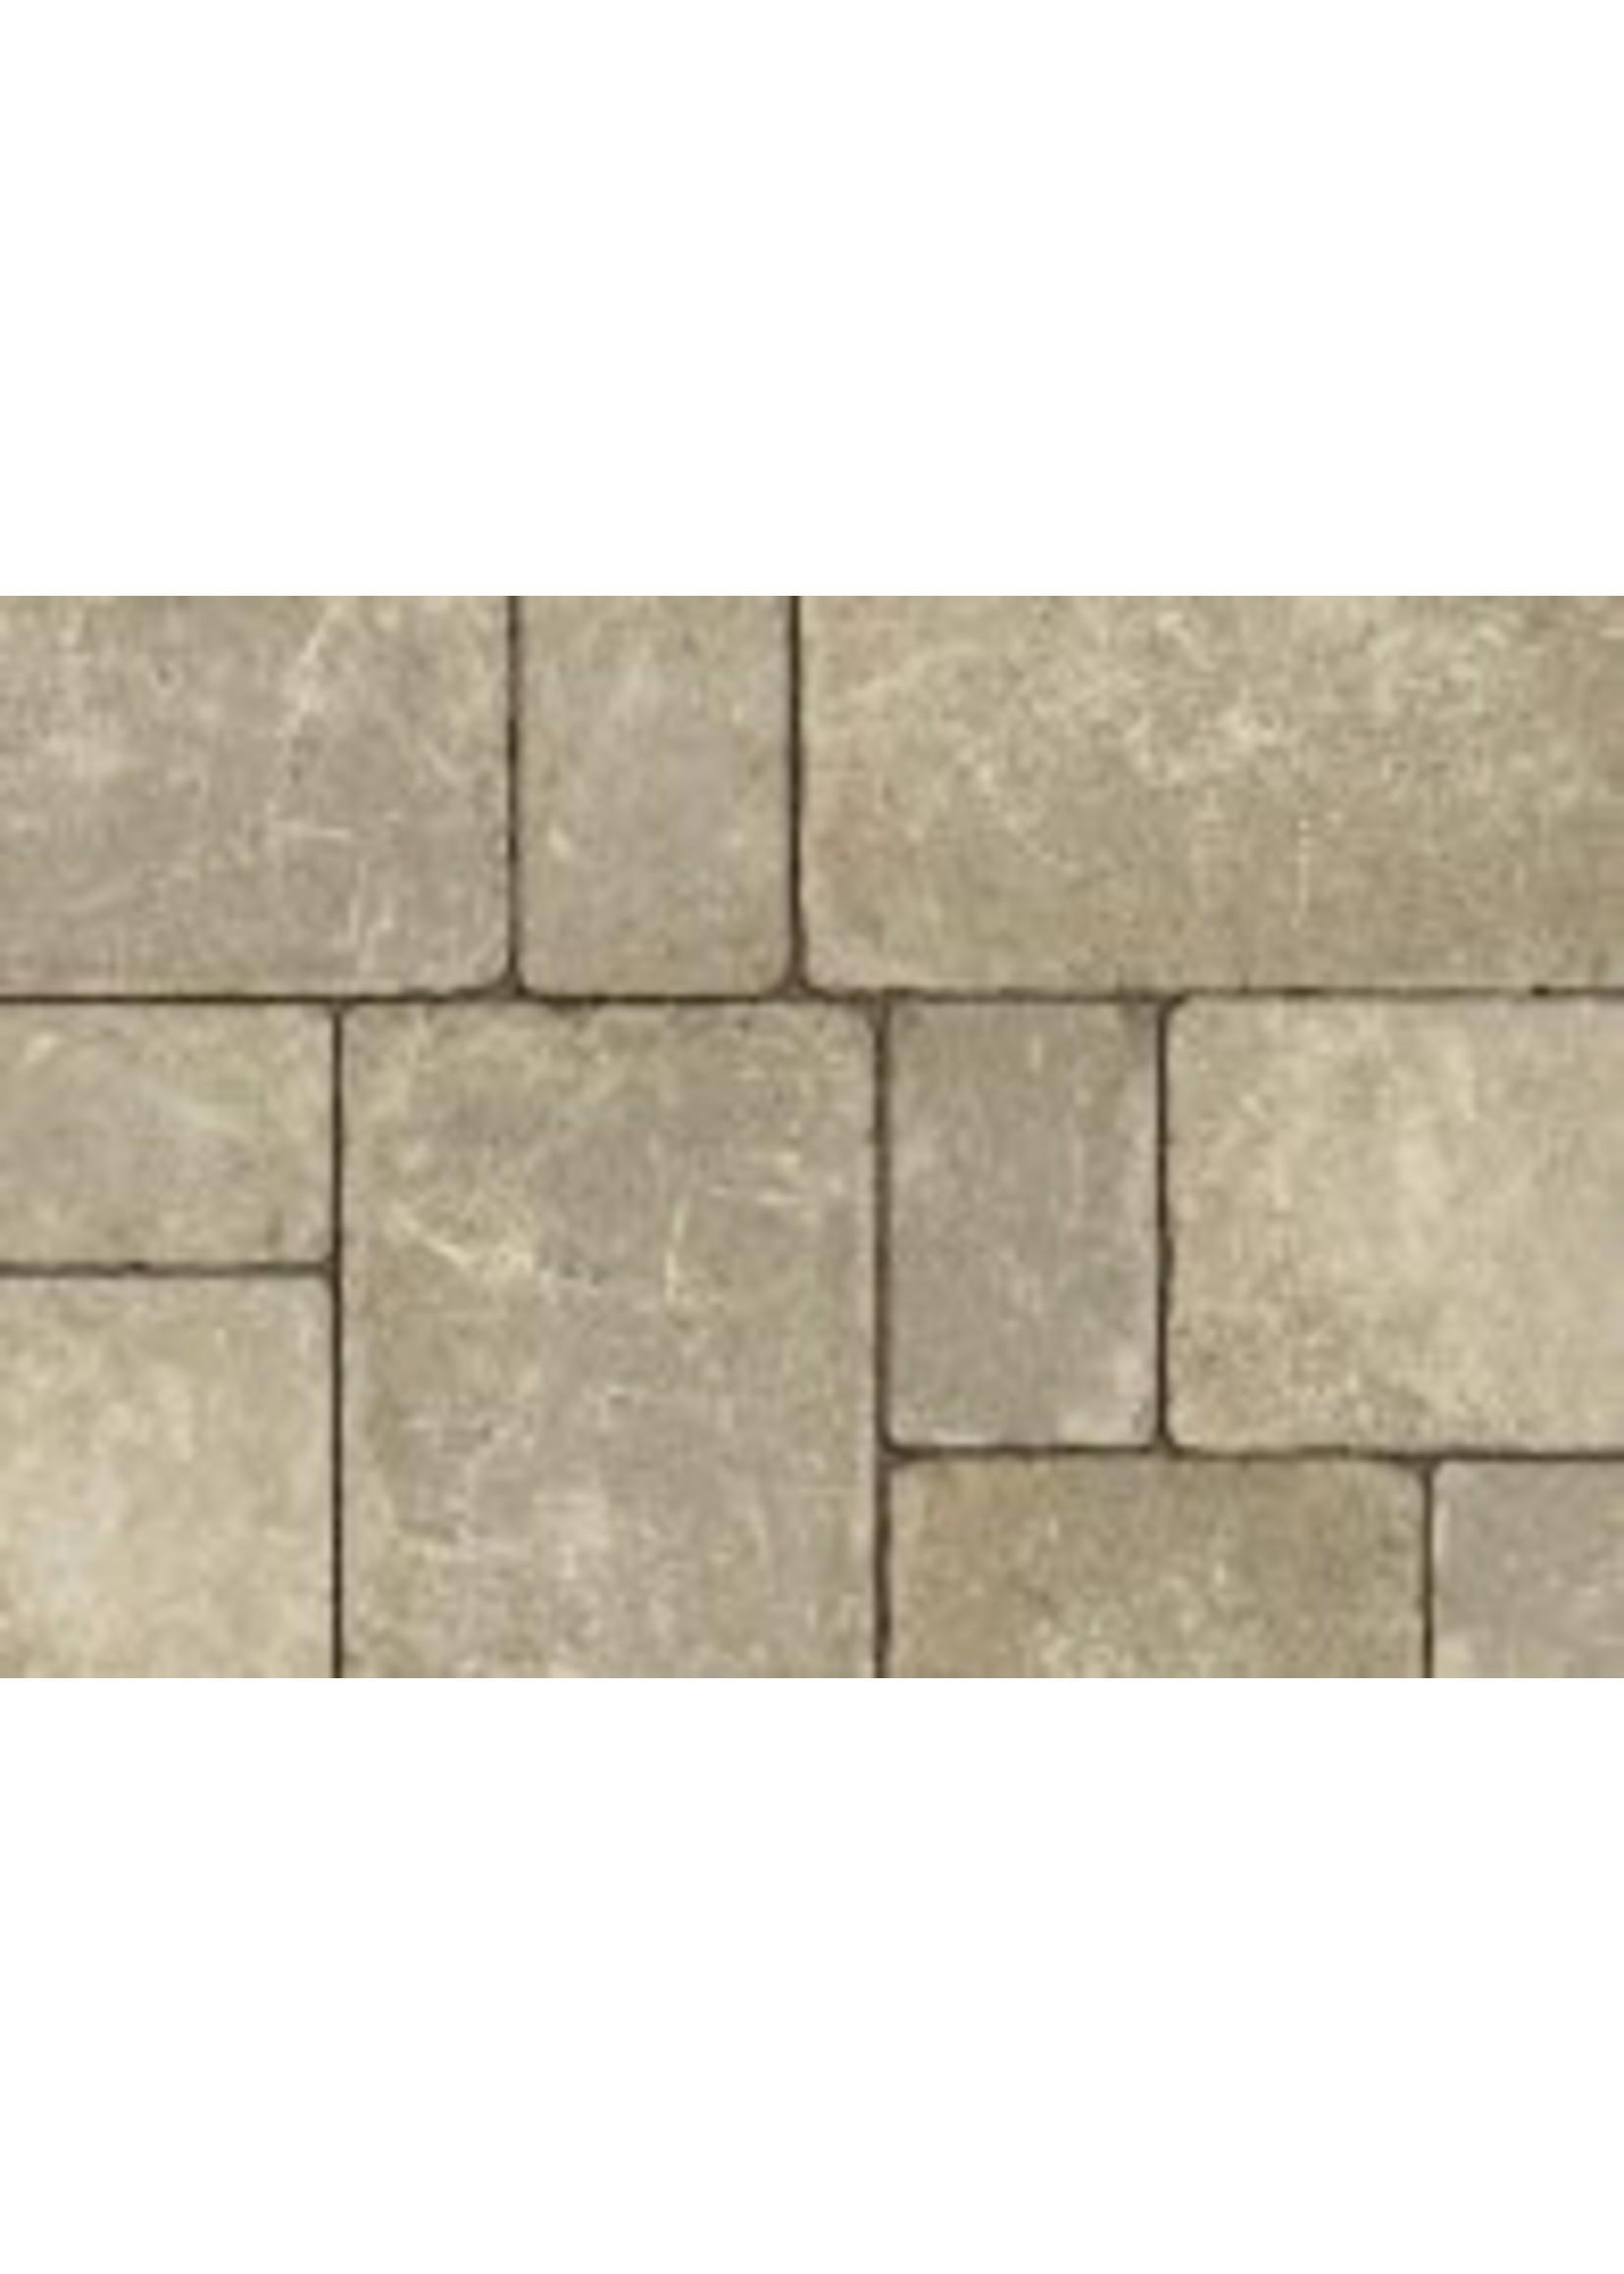 Unilock Brussels Block® Pavers